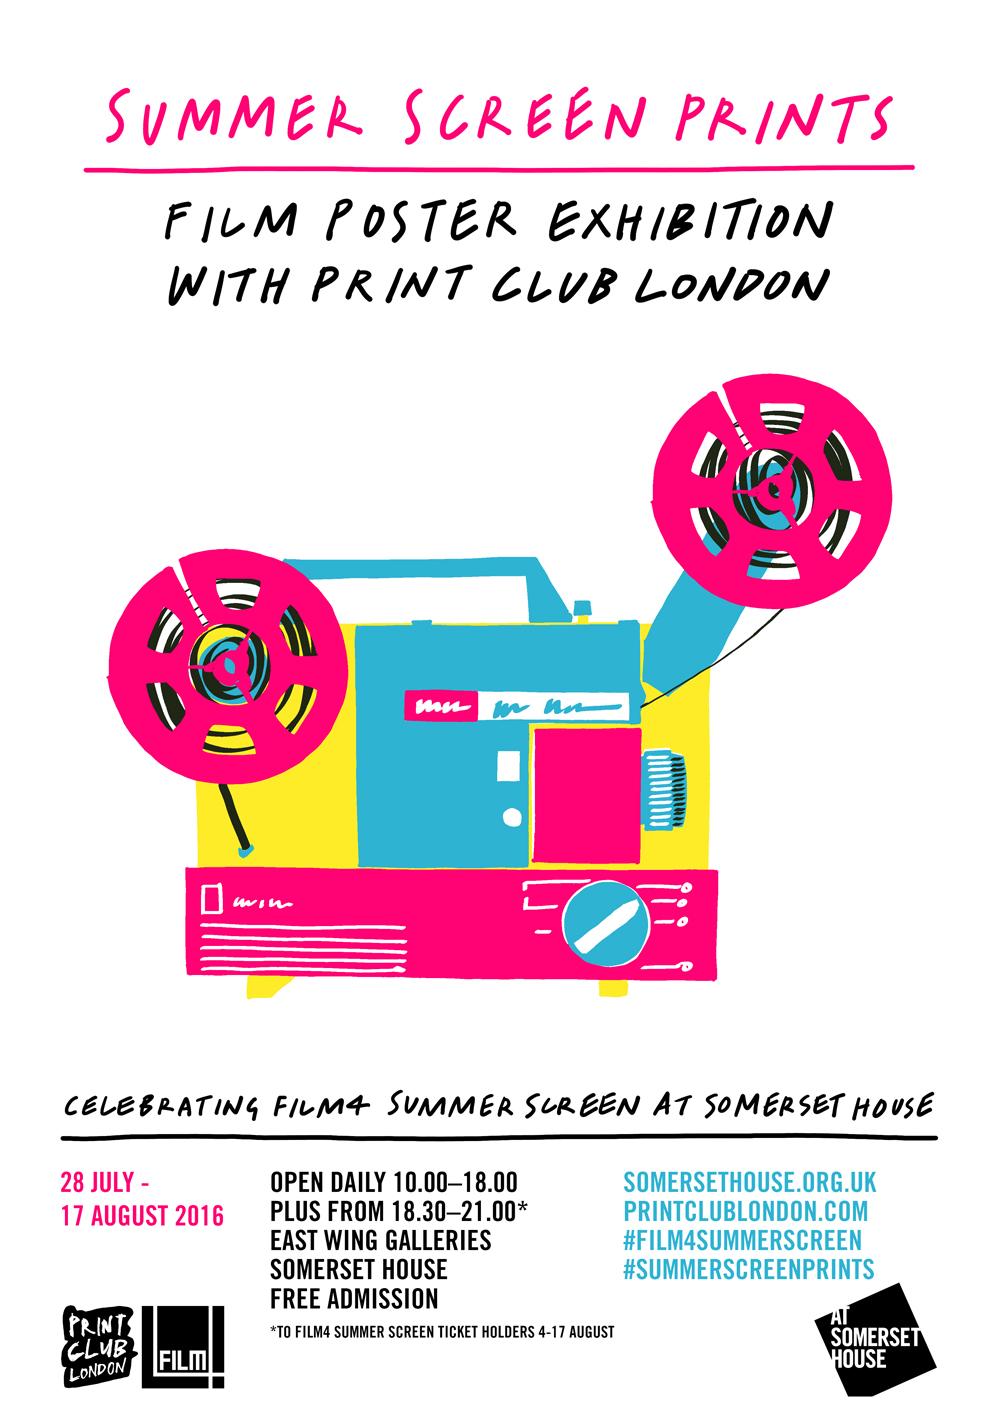 summer-screen-prints-somerset-house-print-club-london-2016